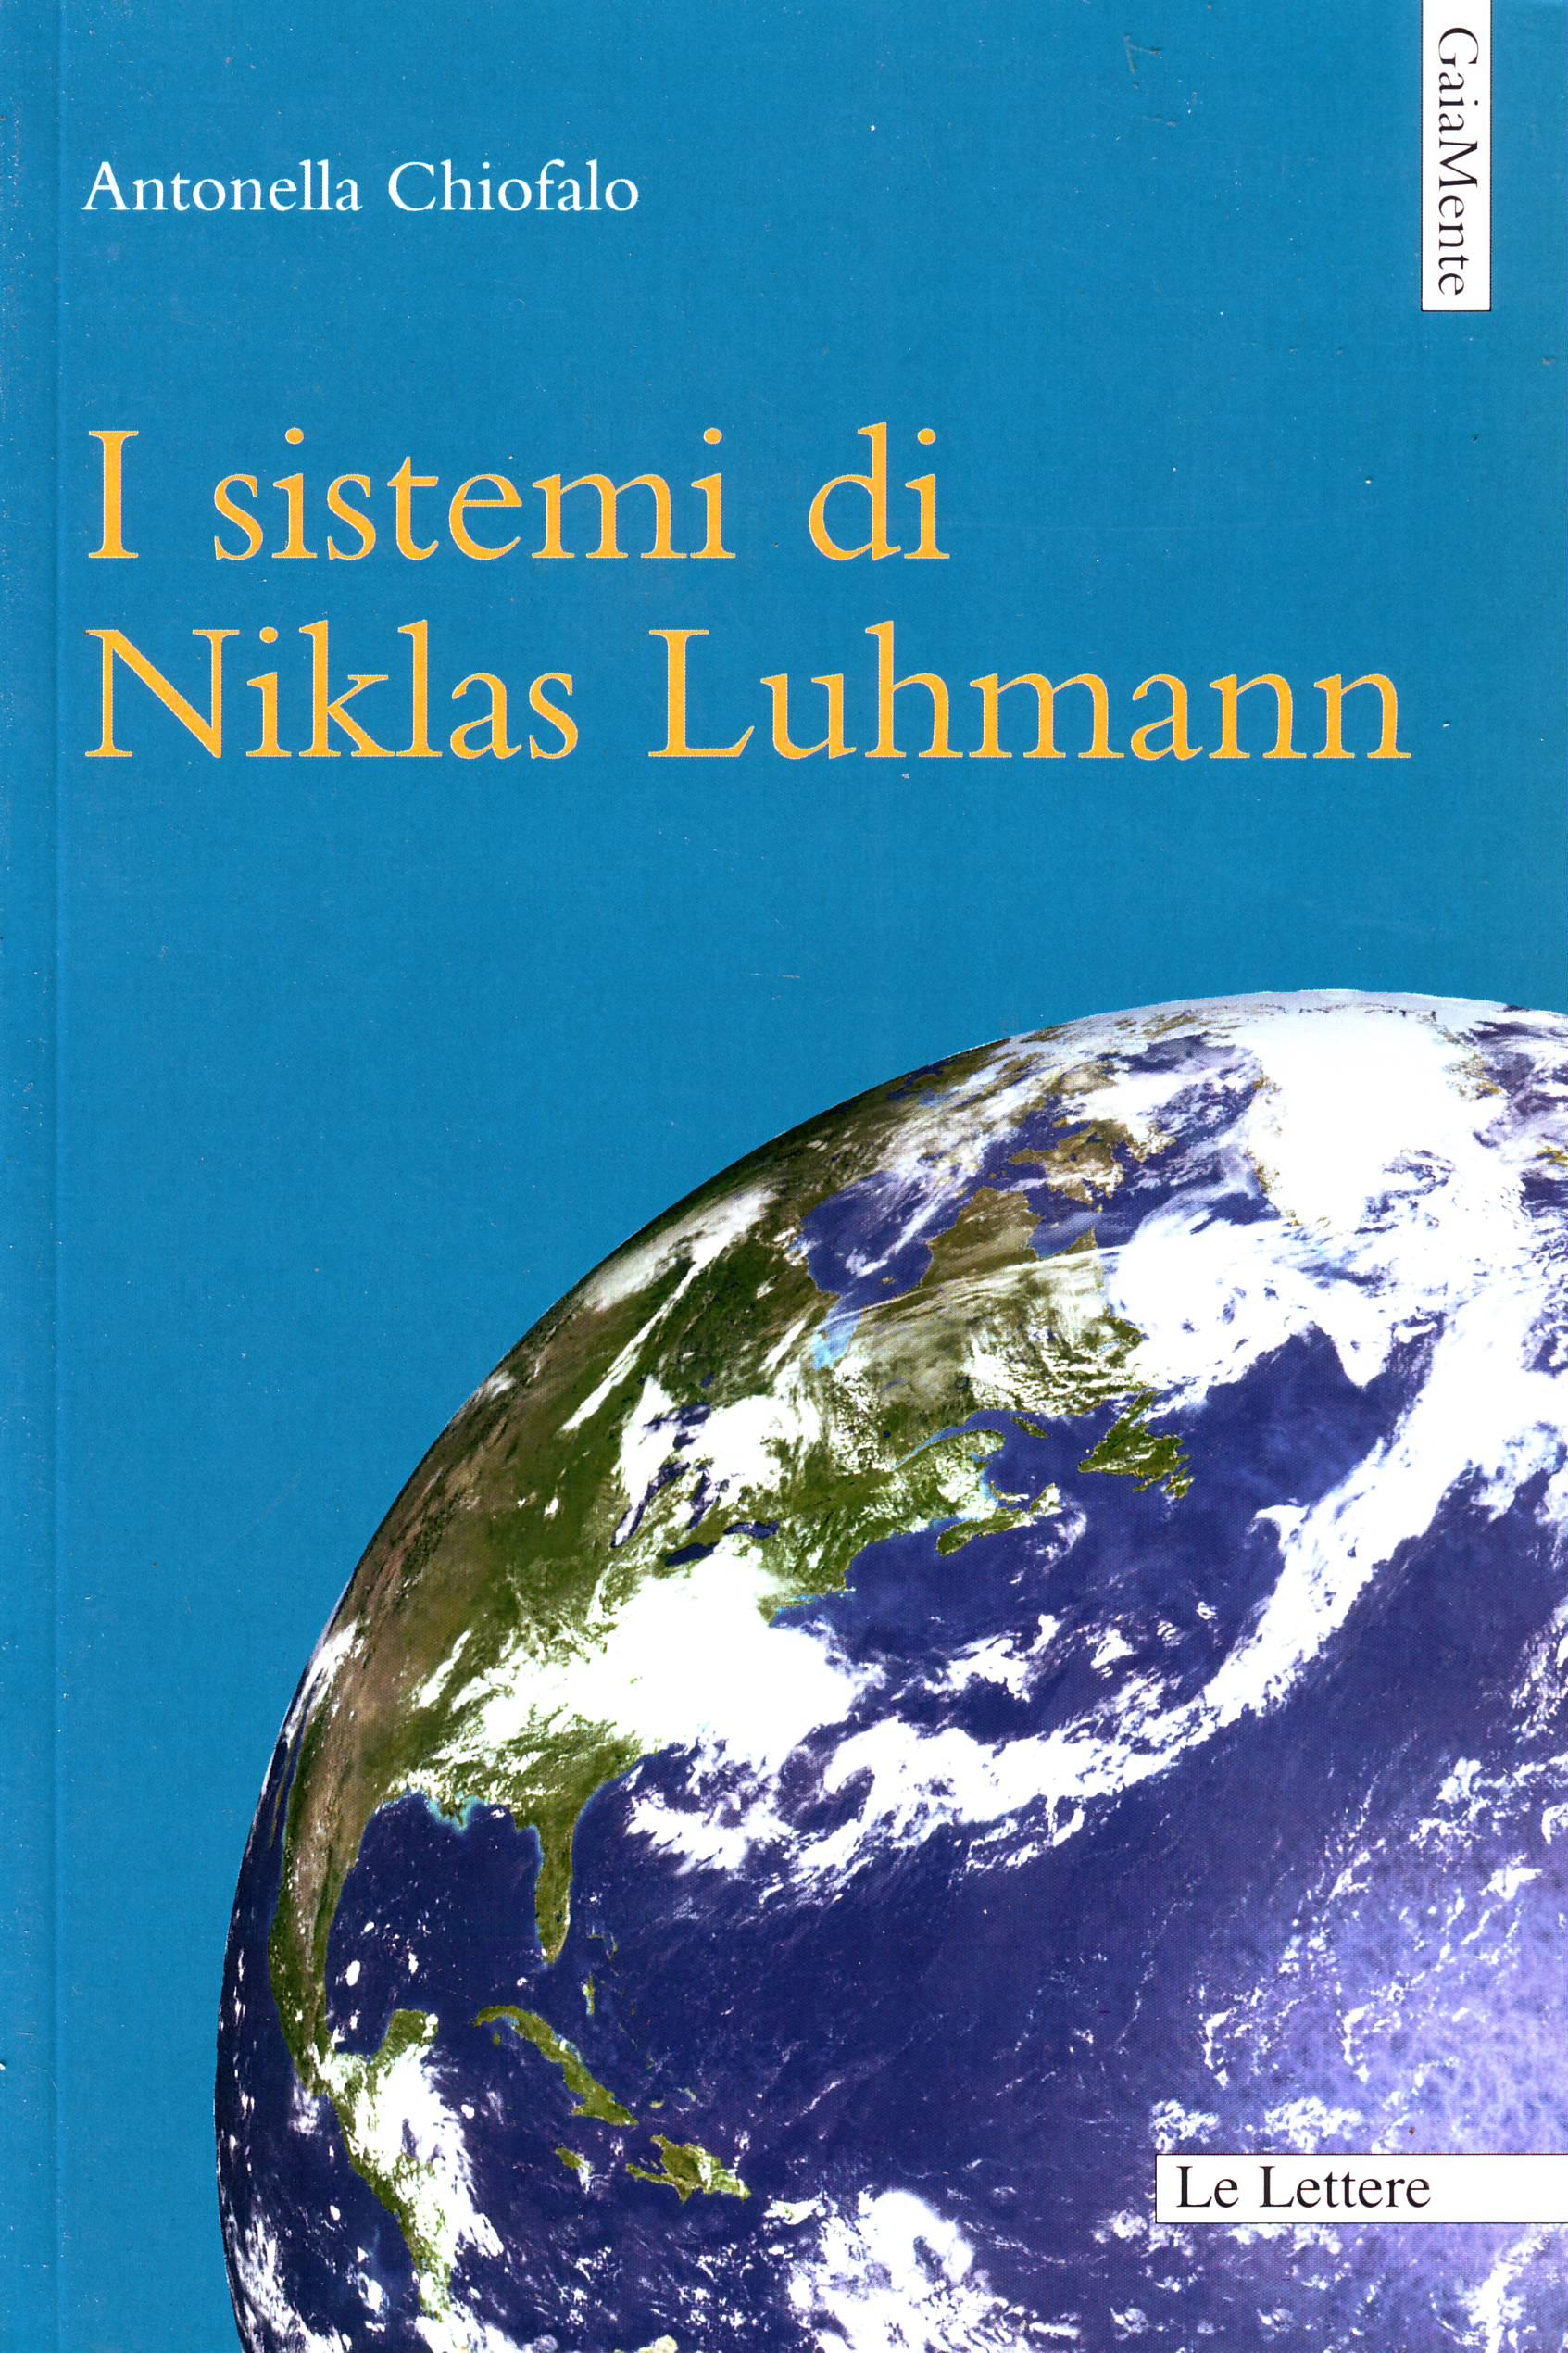 I sistemi di Niklas Luhmann